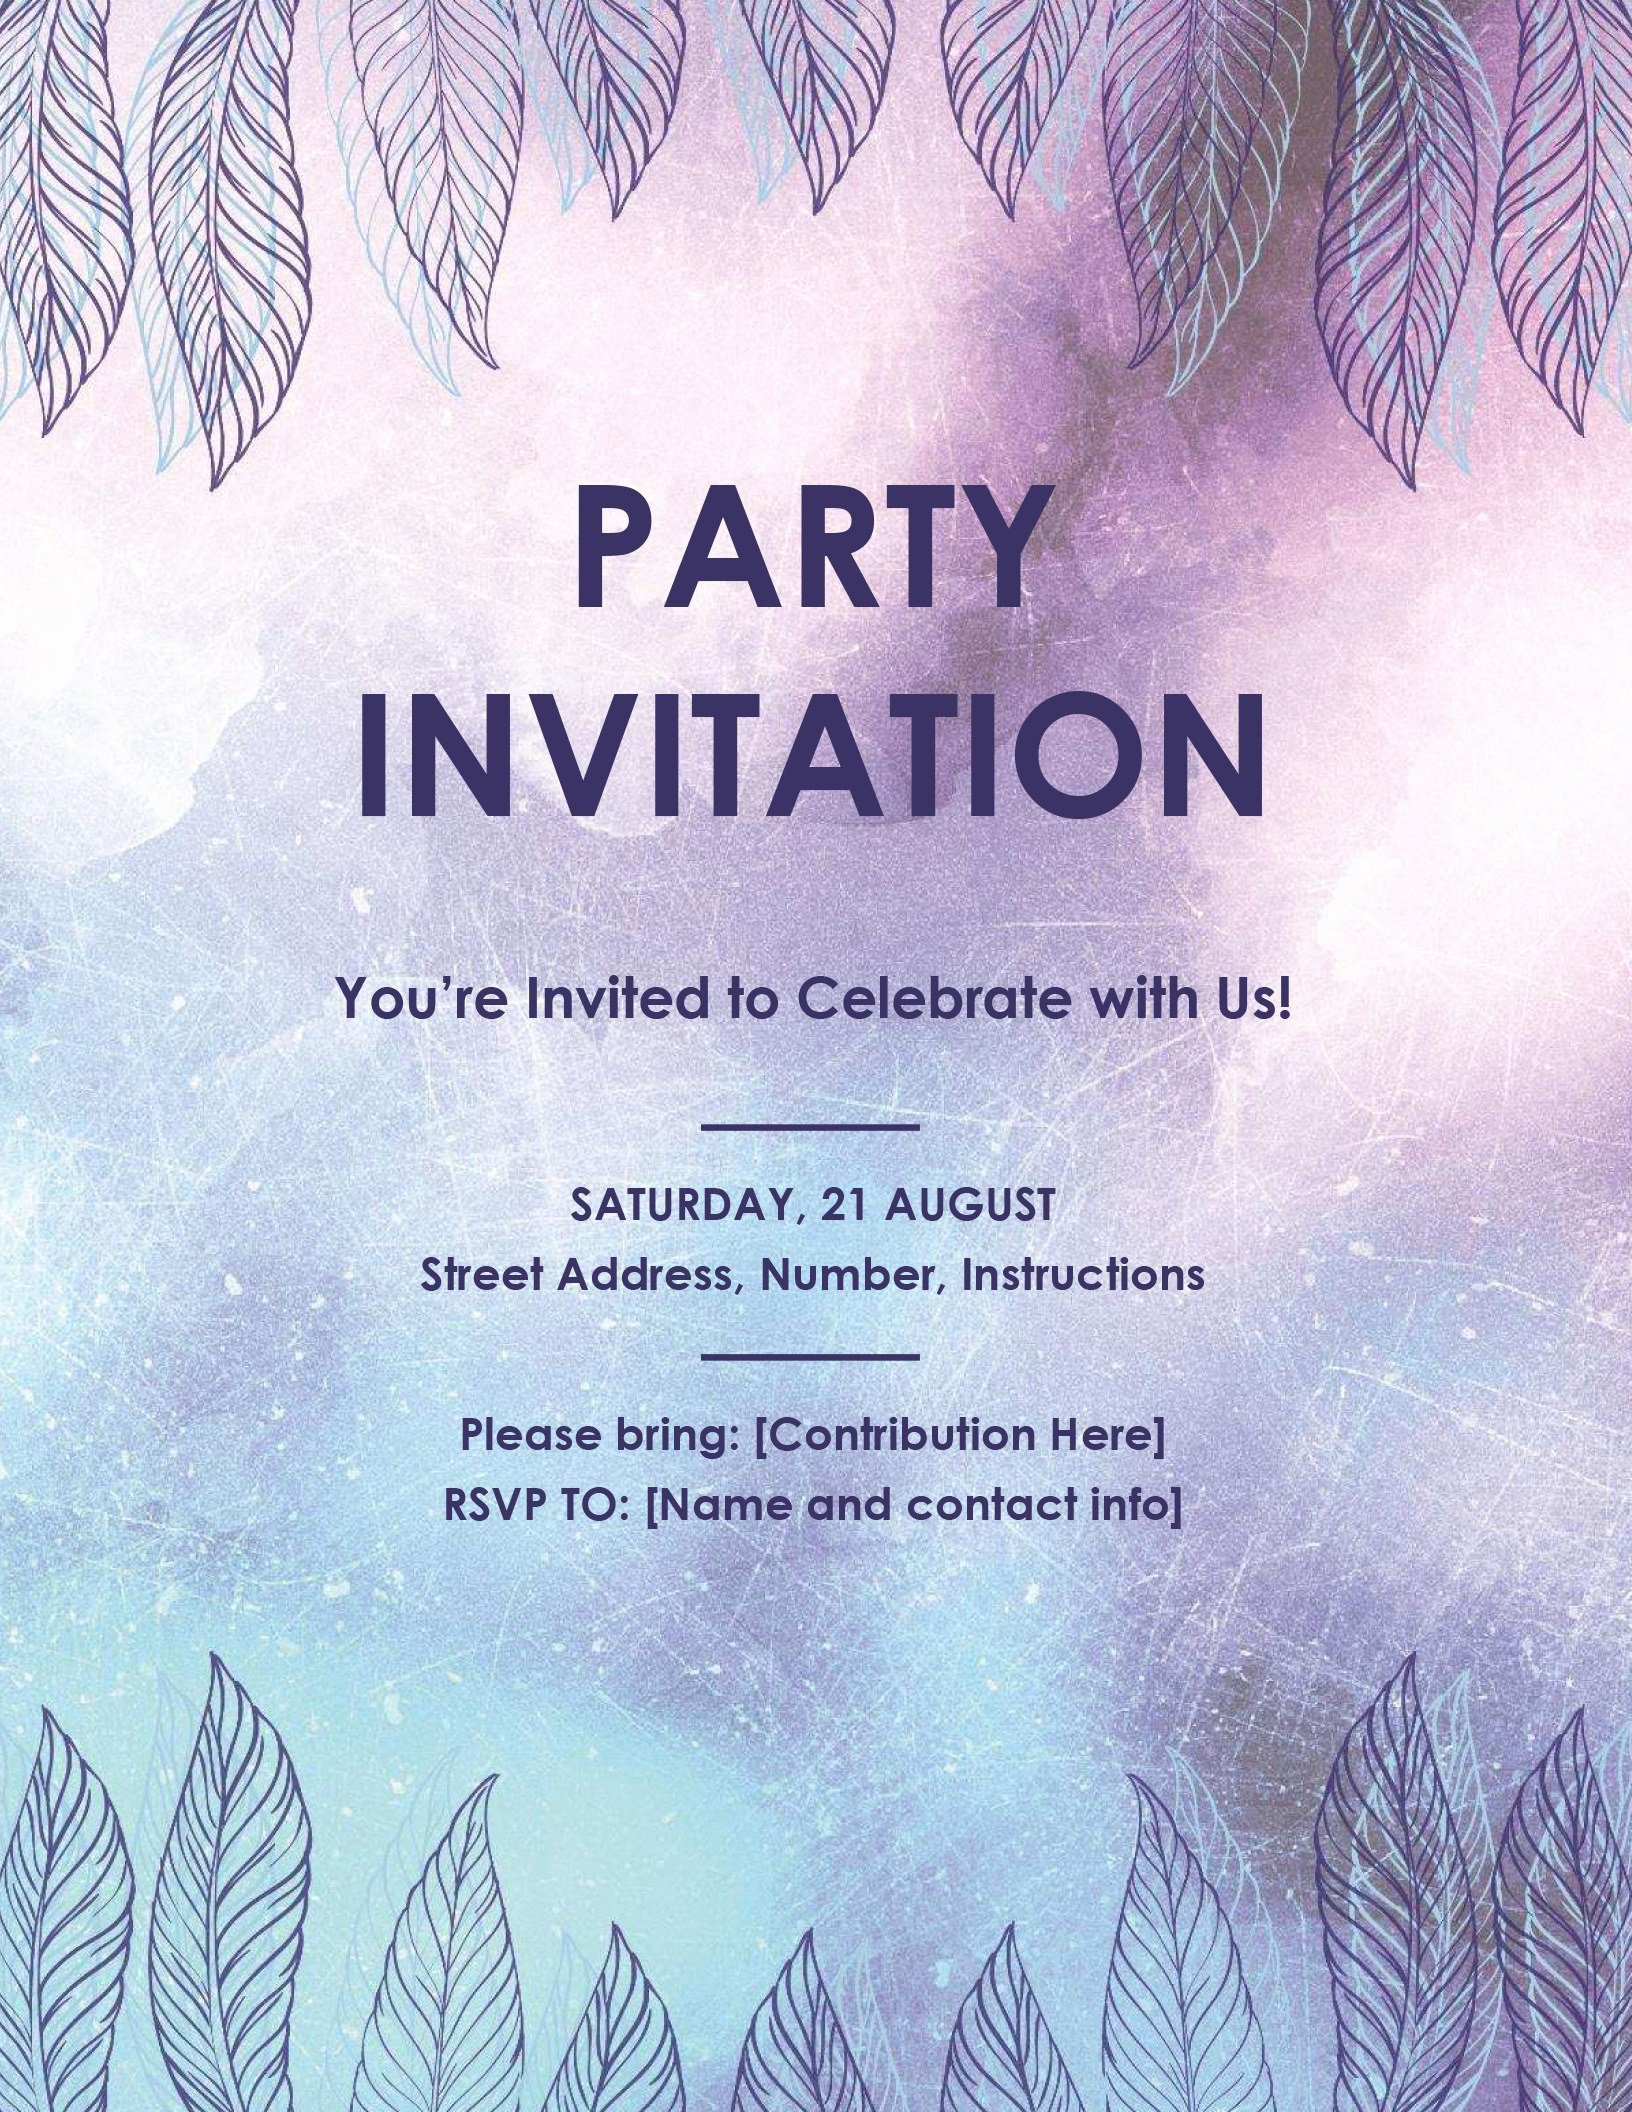 Birthday Invitation Templates Word Lovely Invitation Templates